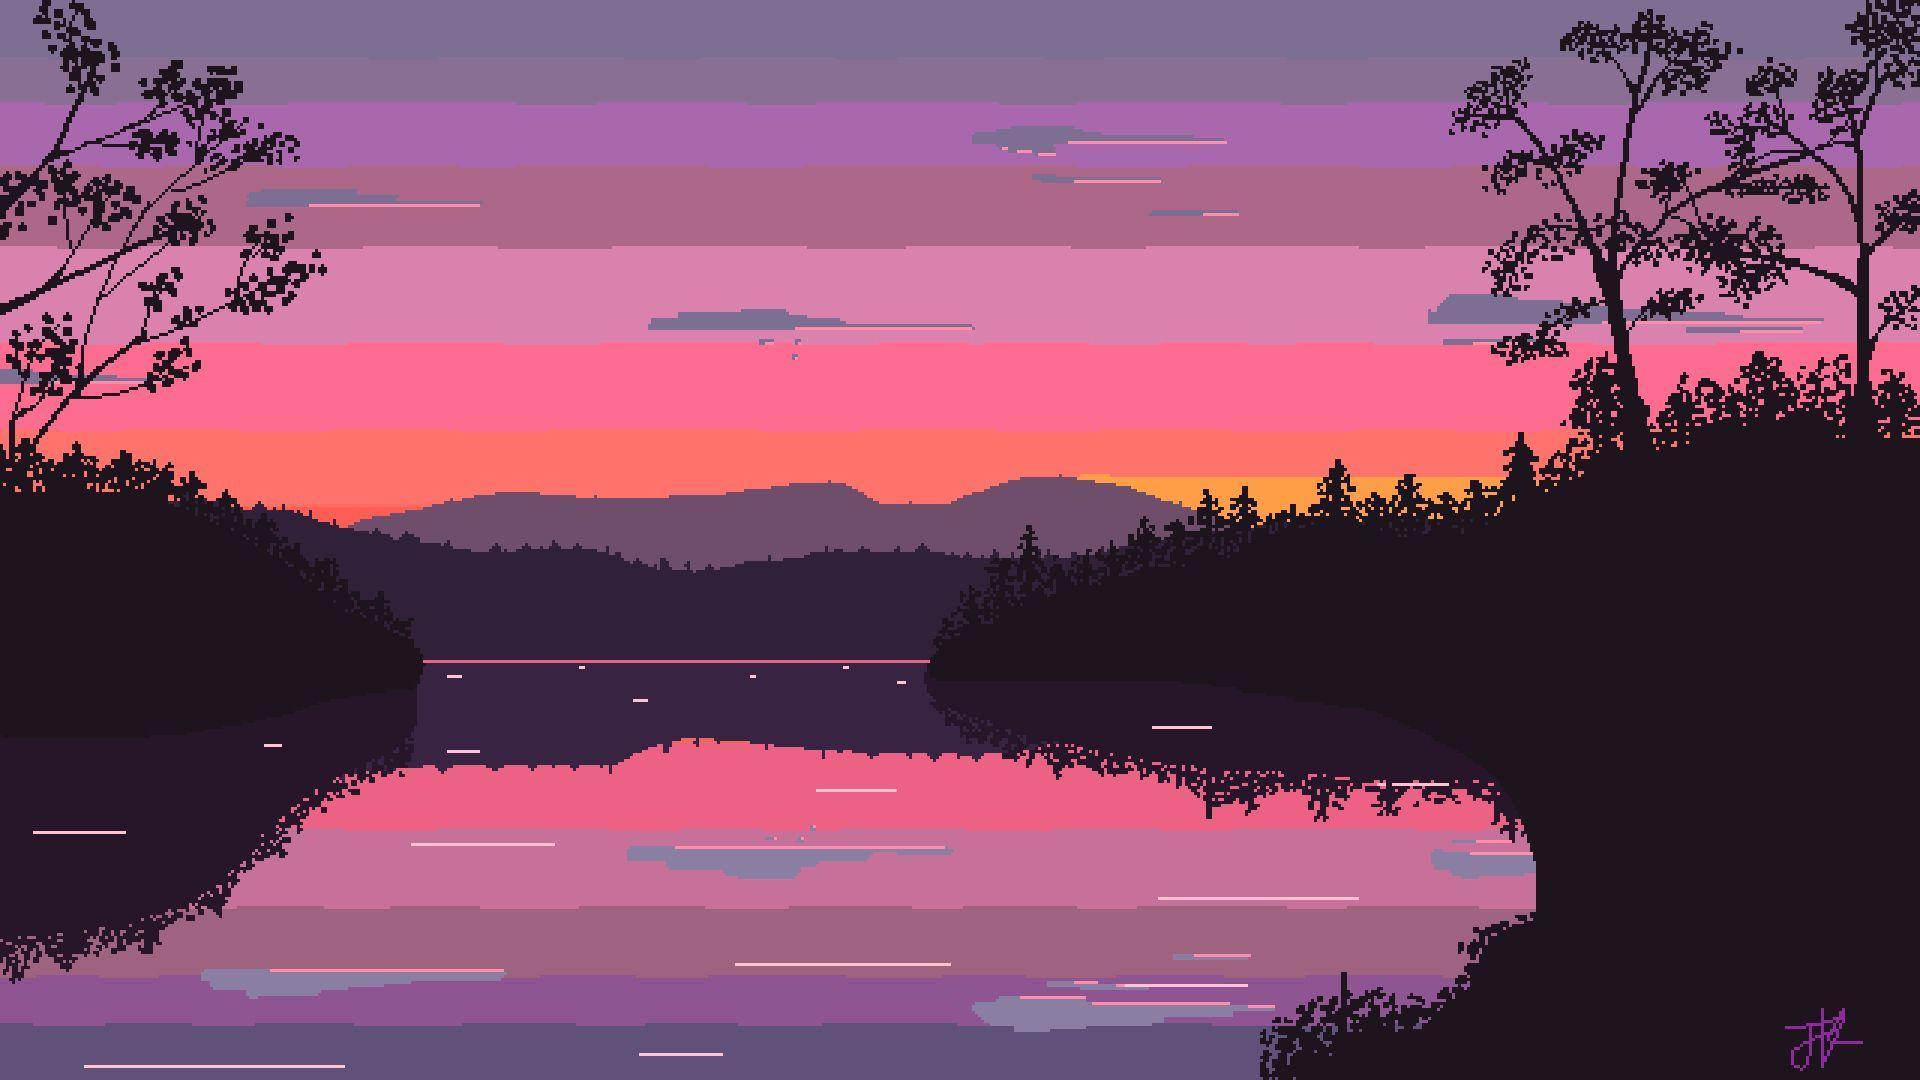 16 Bit Wallpapers Top Free 16 Bit Backgrounds Wallpaperaccess